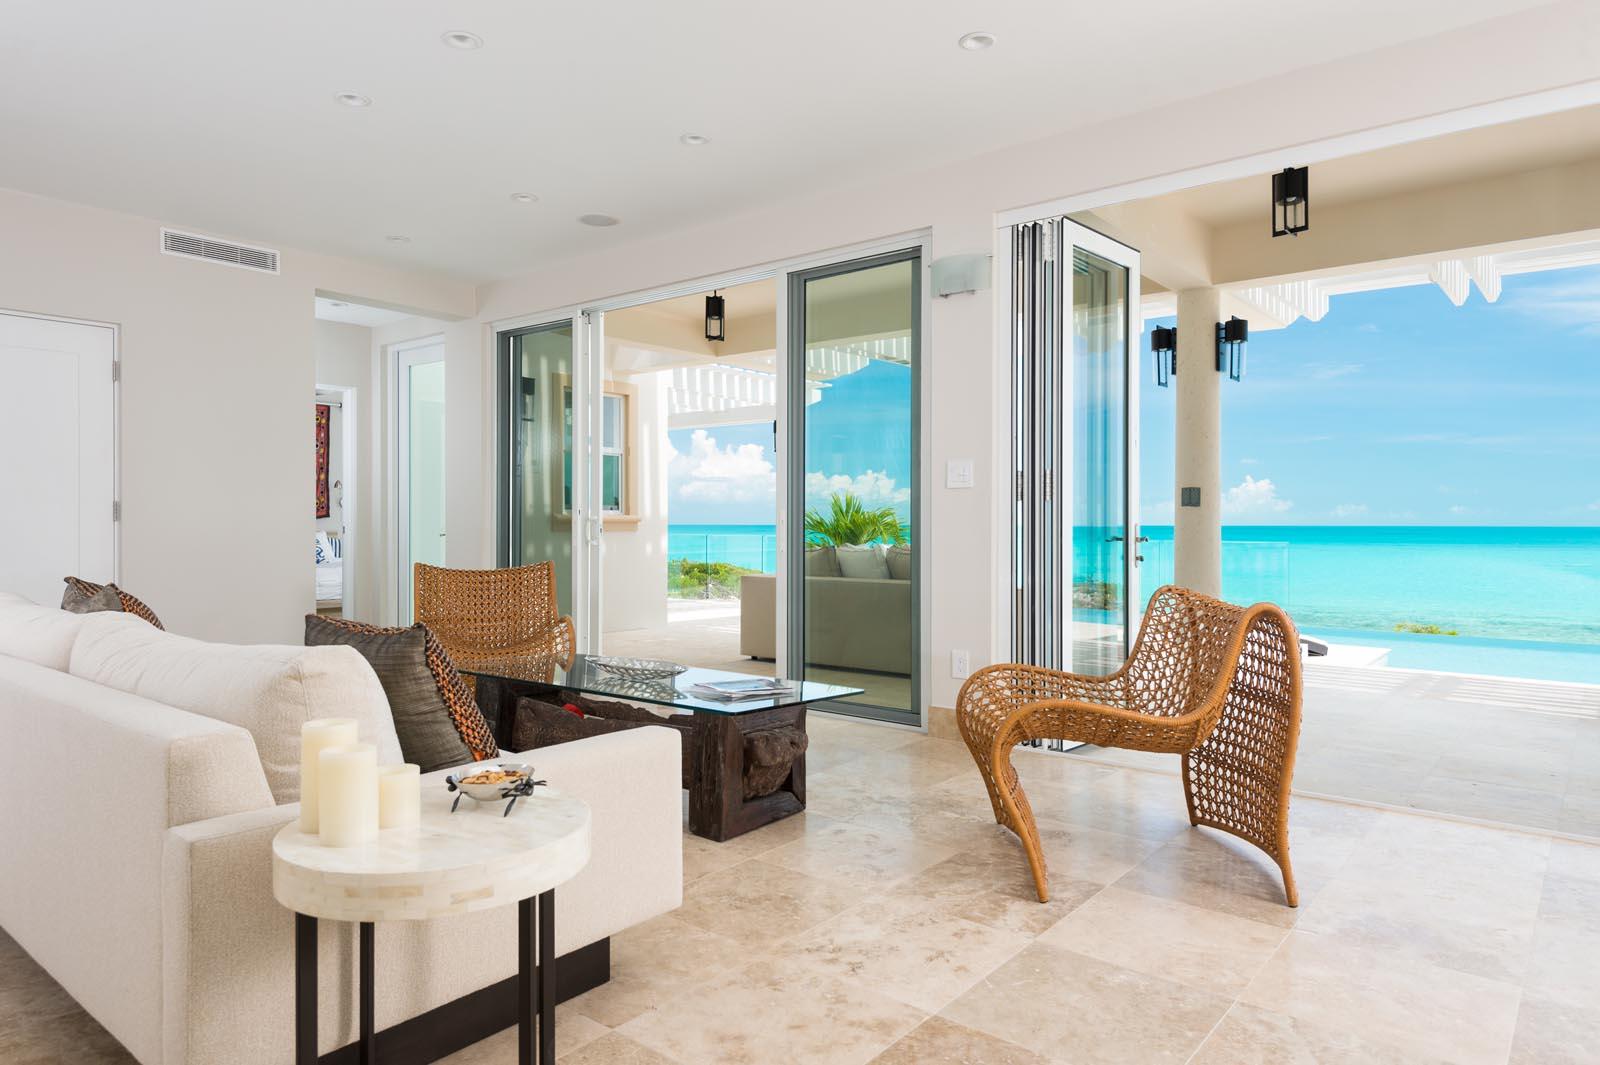 villa isla, long bay beach, providenciales (provo) / turks and